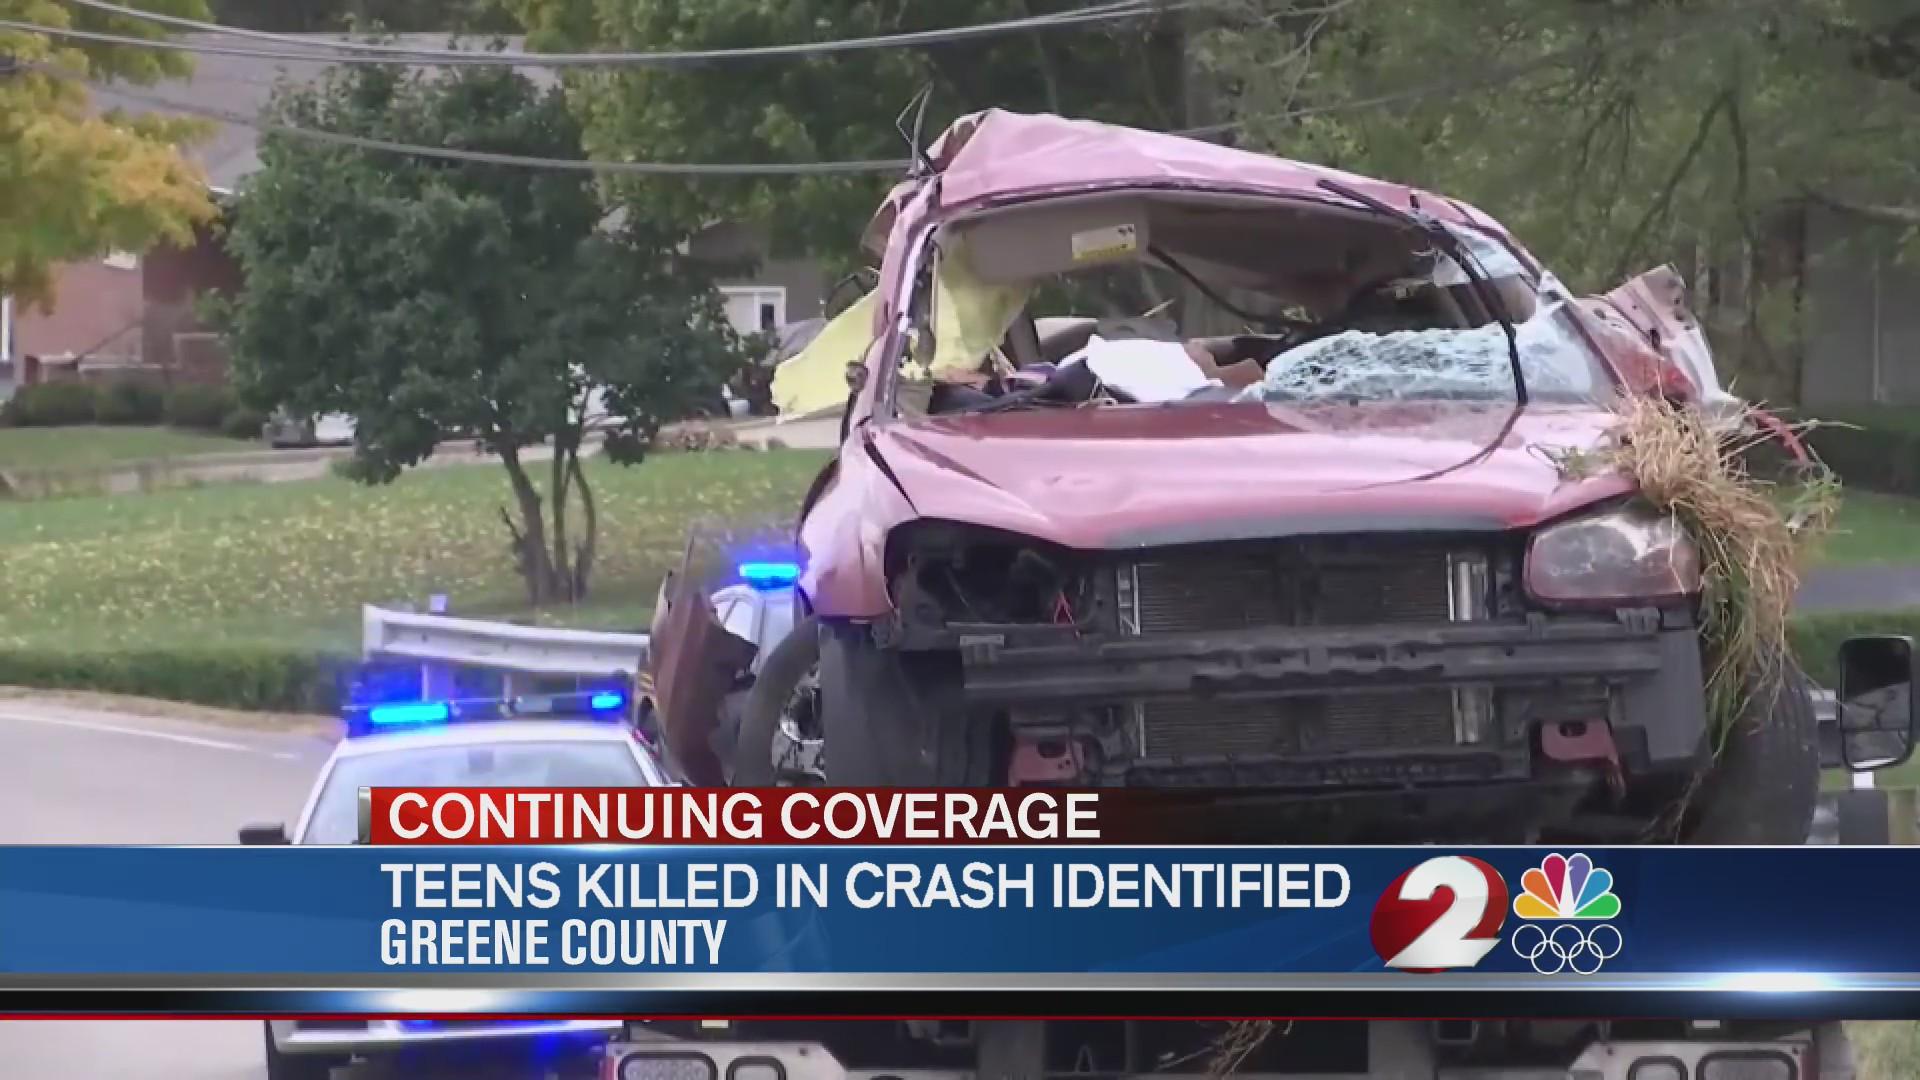 Teens killed in crash identified